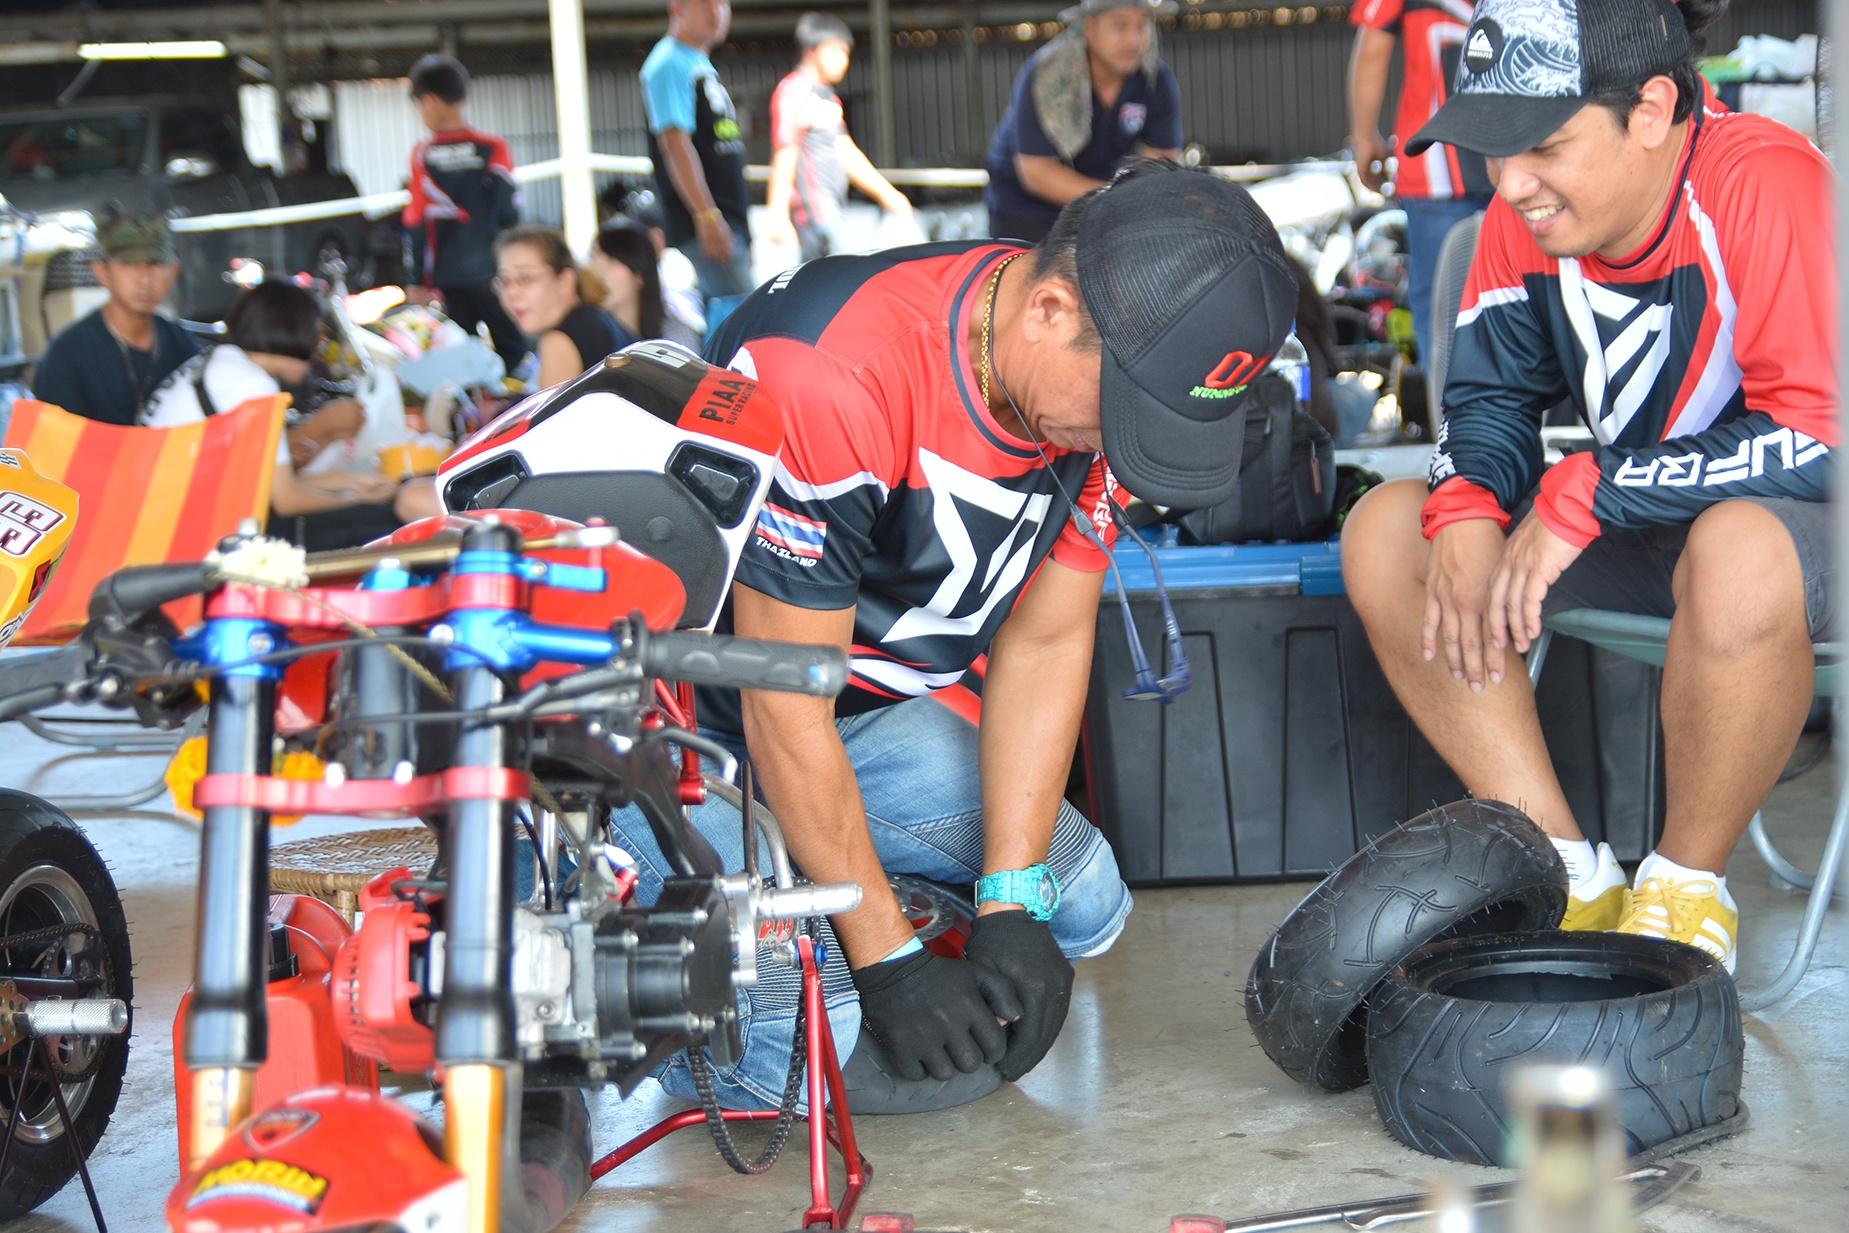 Giai dua moto tre em o Thai Lan va nhung giac mo MotoGP hinh anh 3